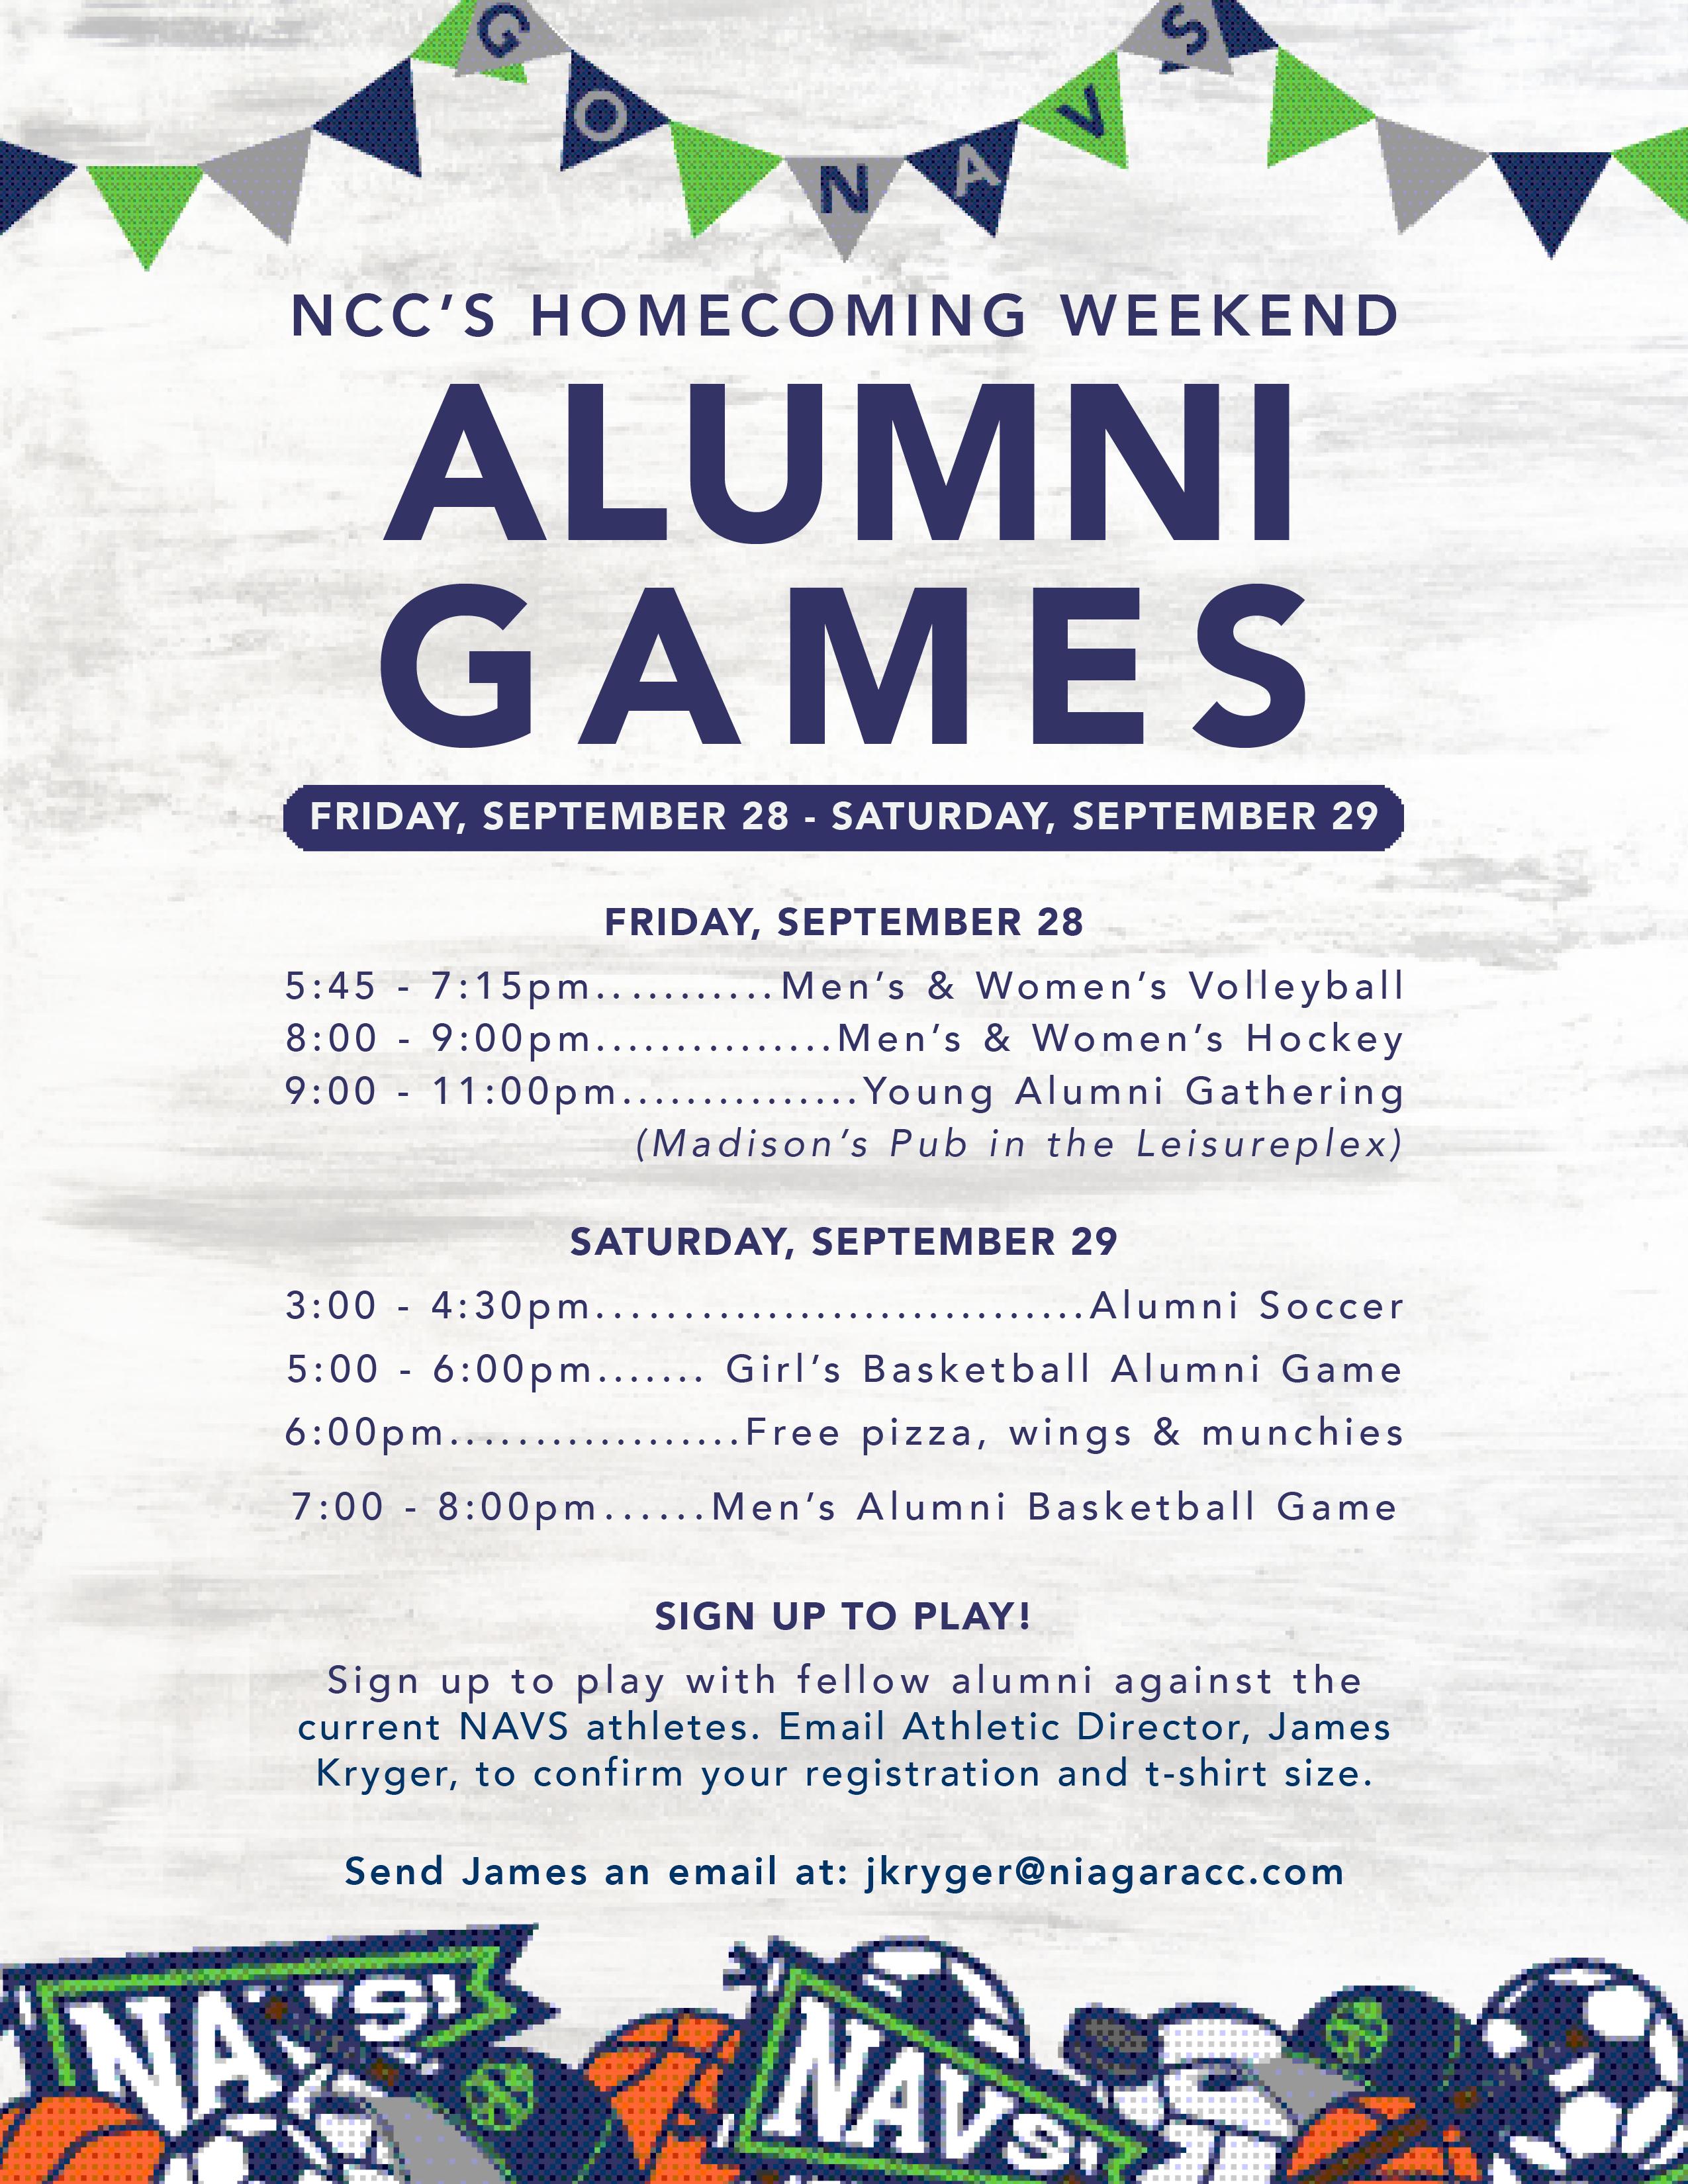 e-alumni_games_ad jpg | Niagara Christian Collegiate